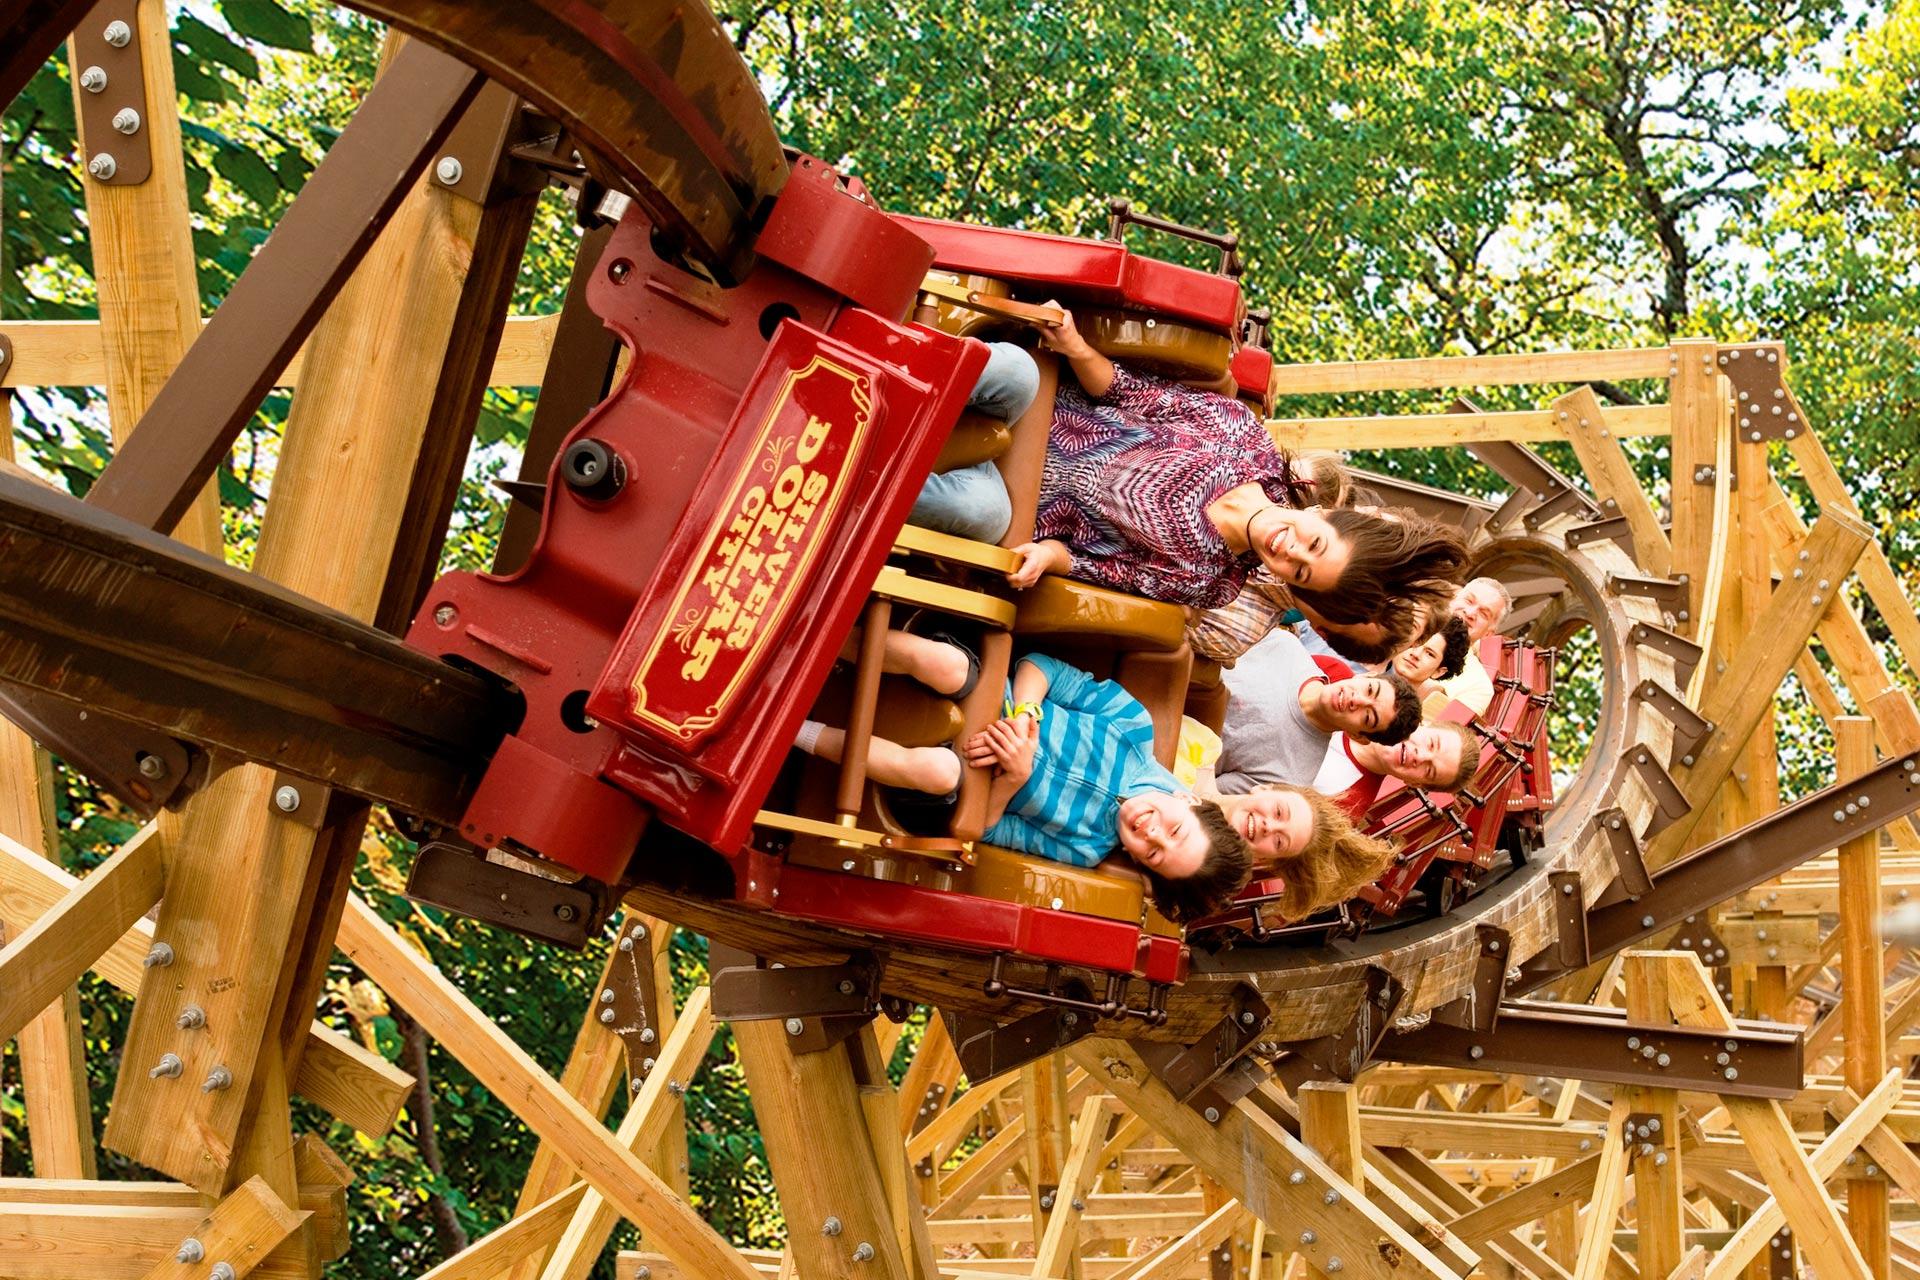 A rollercoaster at Silver Dollar City in Branson, Missouri.